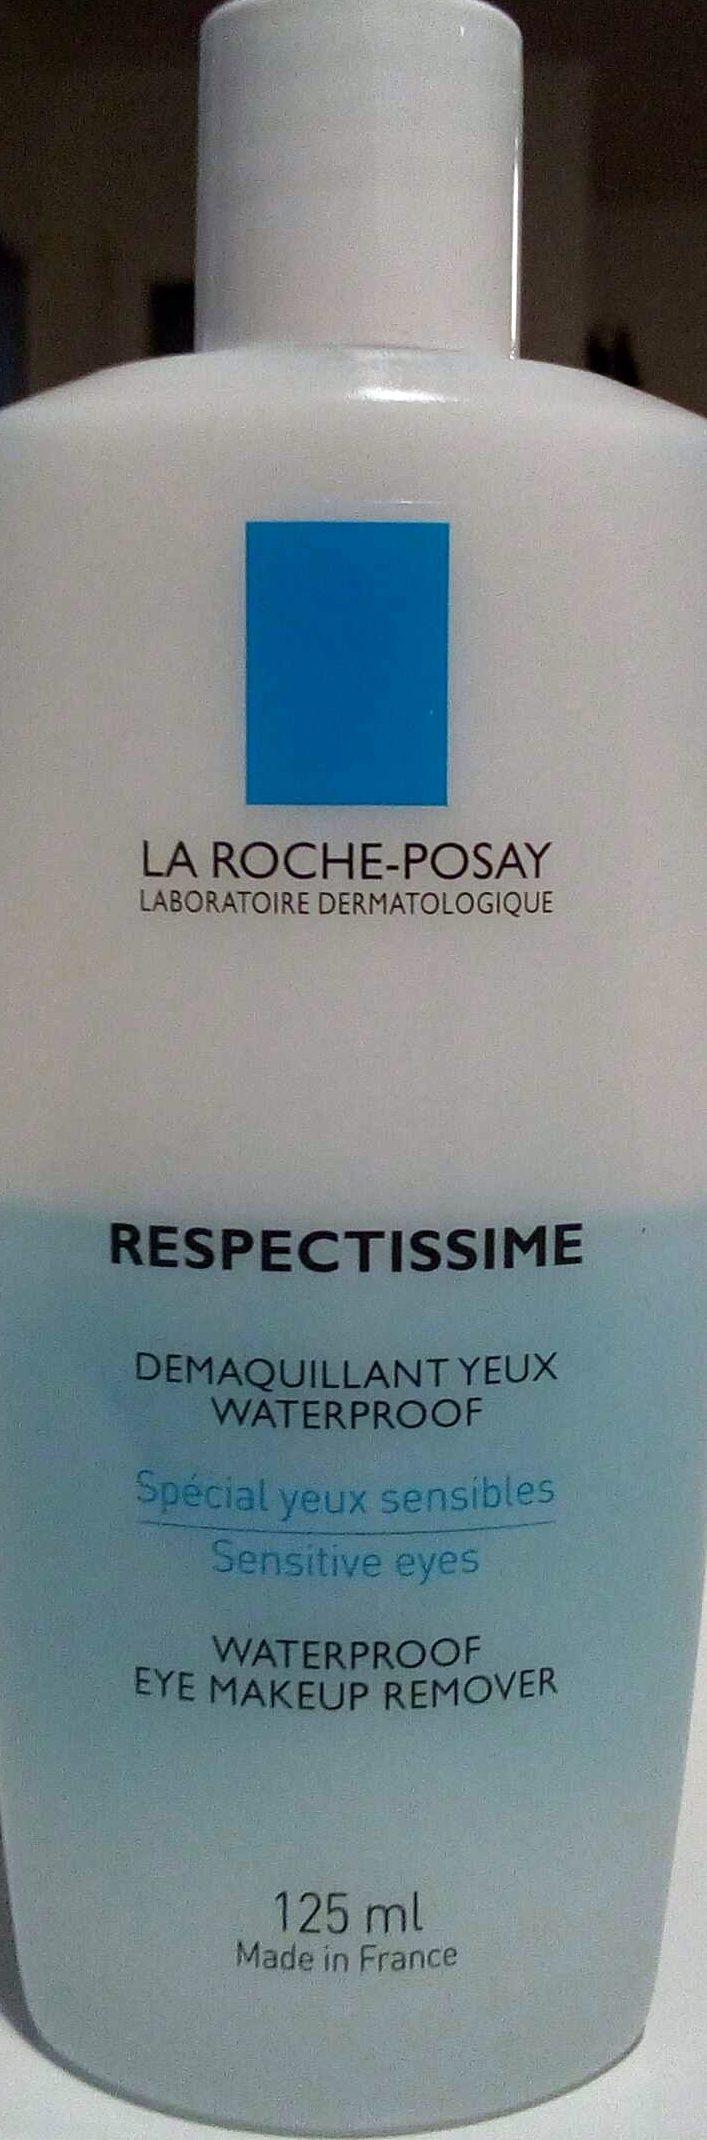 Respectissime - Produit